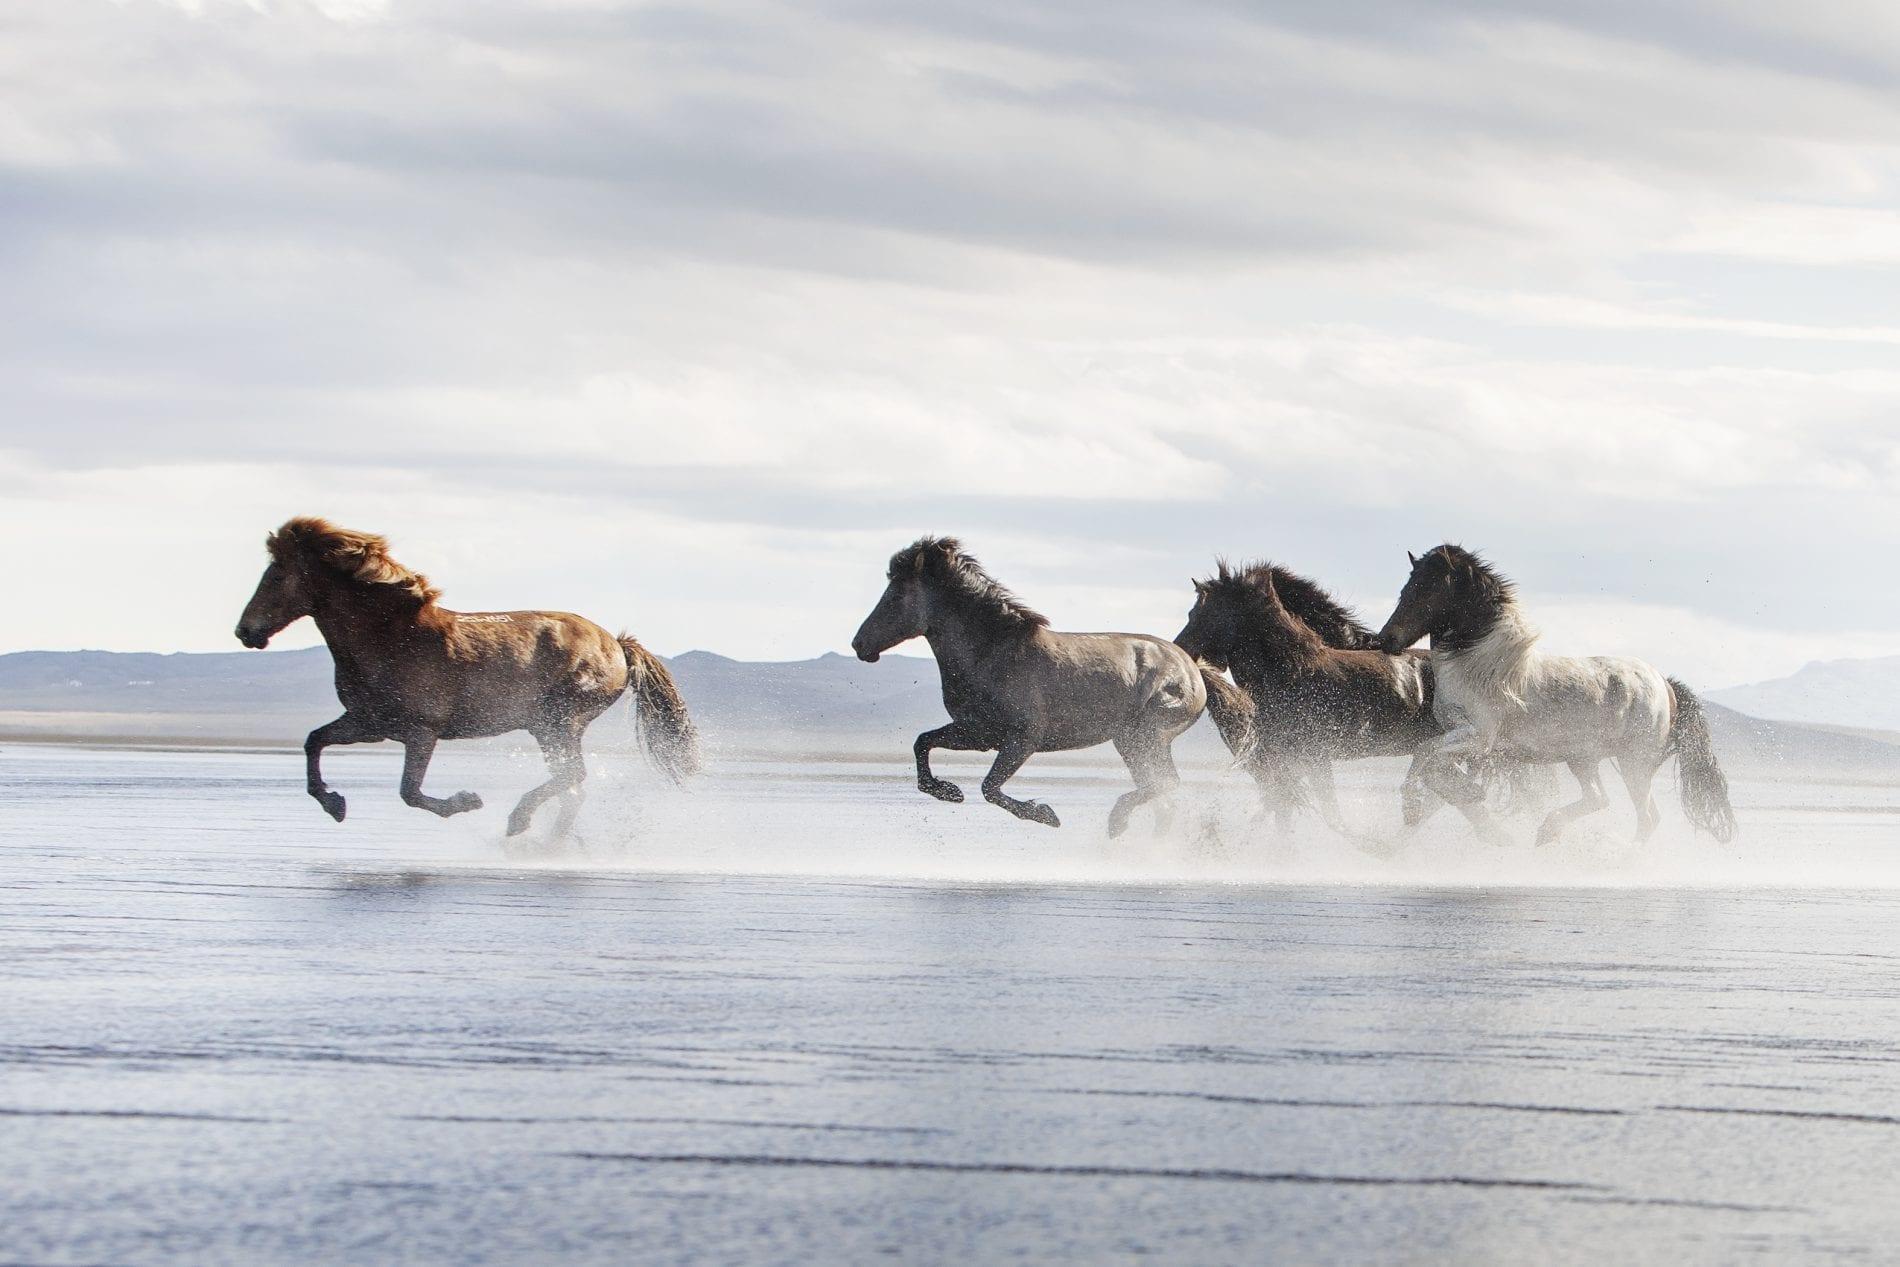 Five horses running along extended sand beach